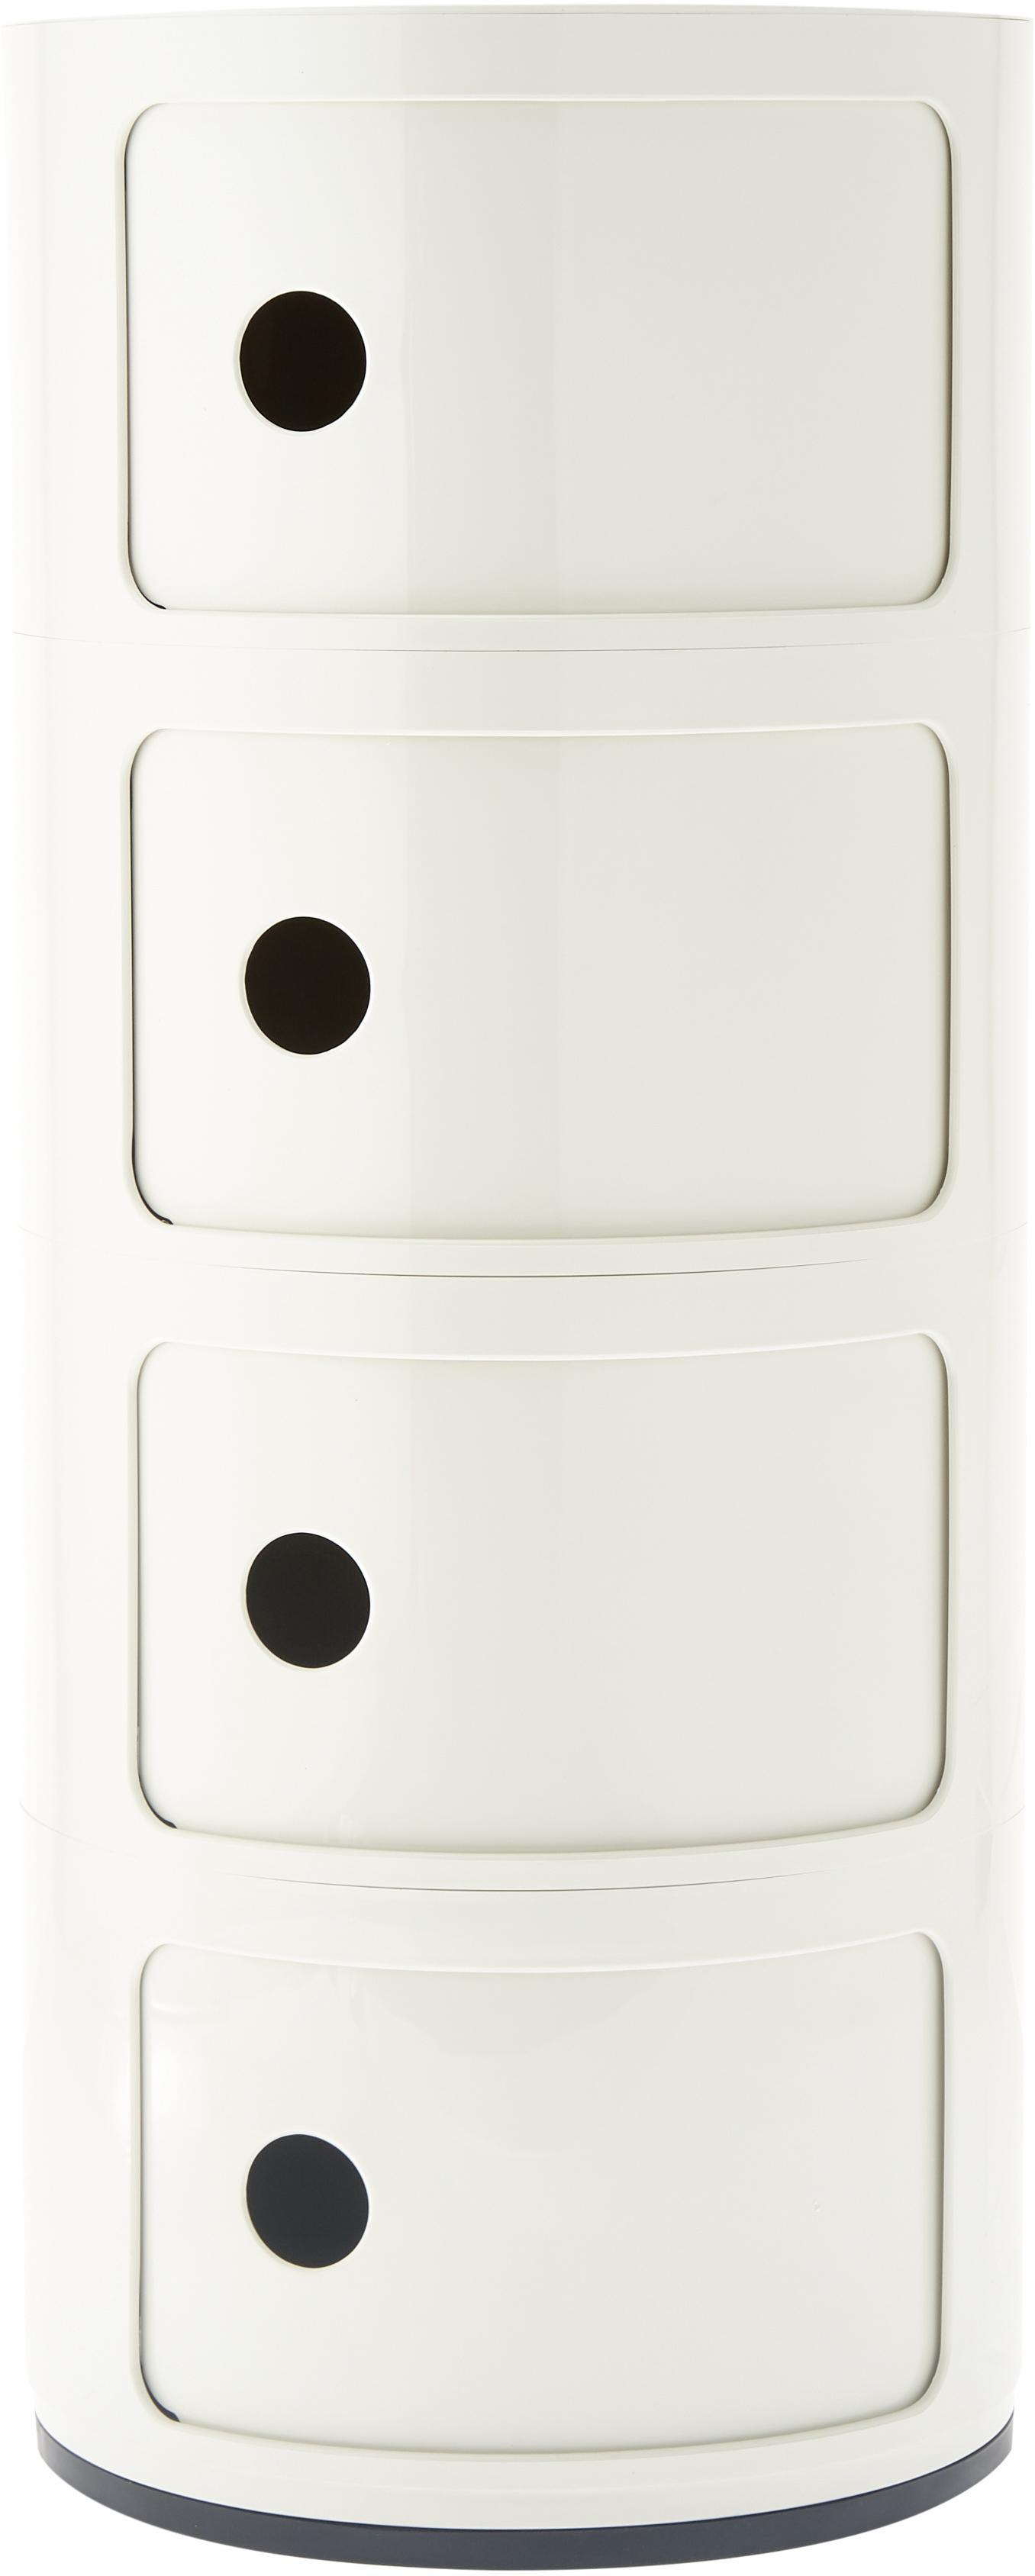 Design Container Componibili 4 Fächer, Kunststoff, Weiss, Ø 32 x H 77 cm